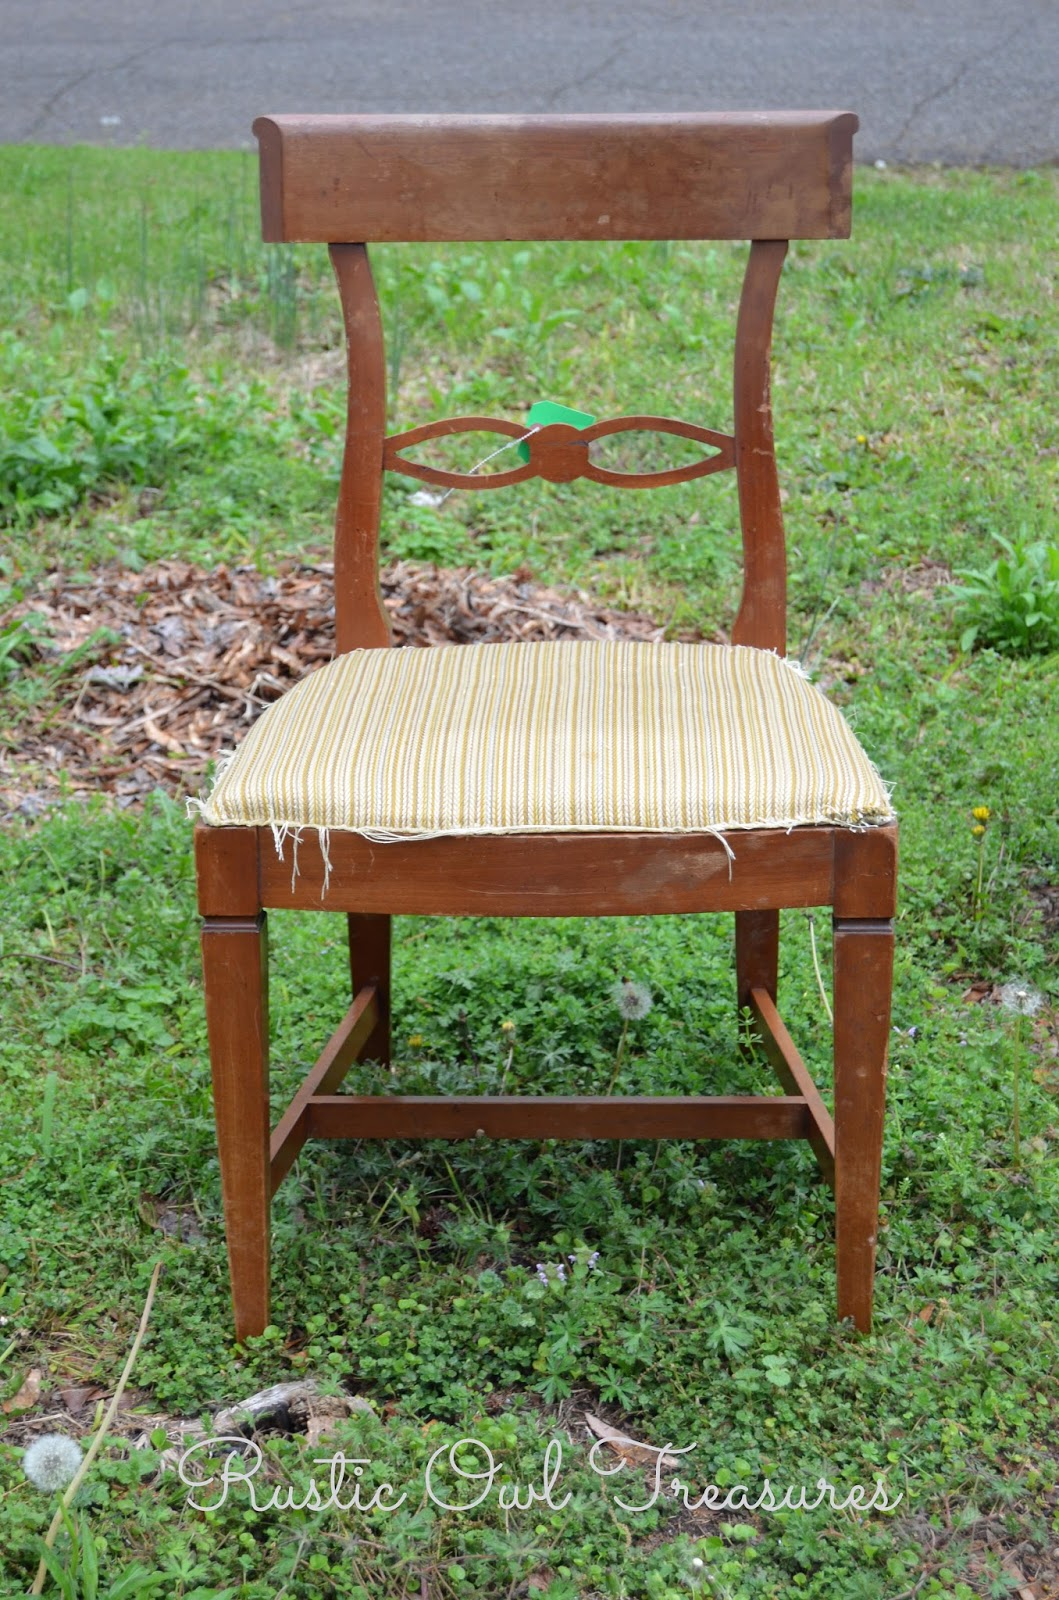 Buffalo Plaid Chair Target Computer Chairs Rustic Owl Treasures Blue Check